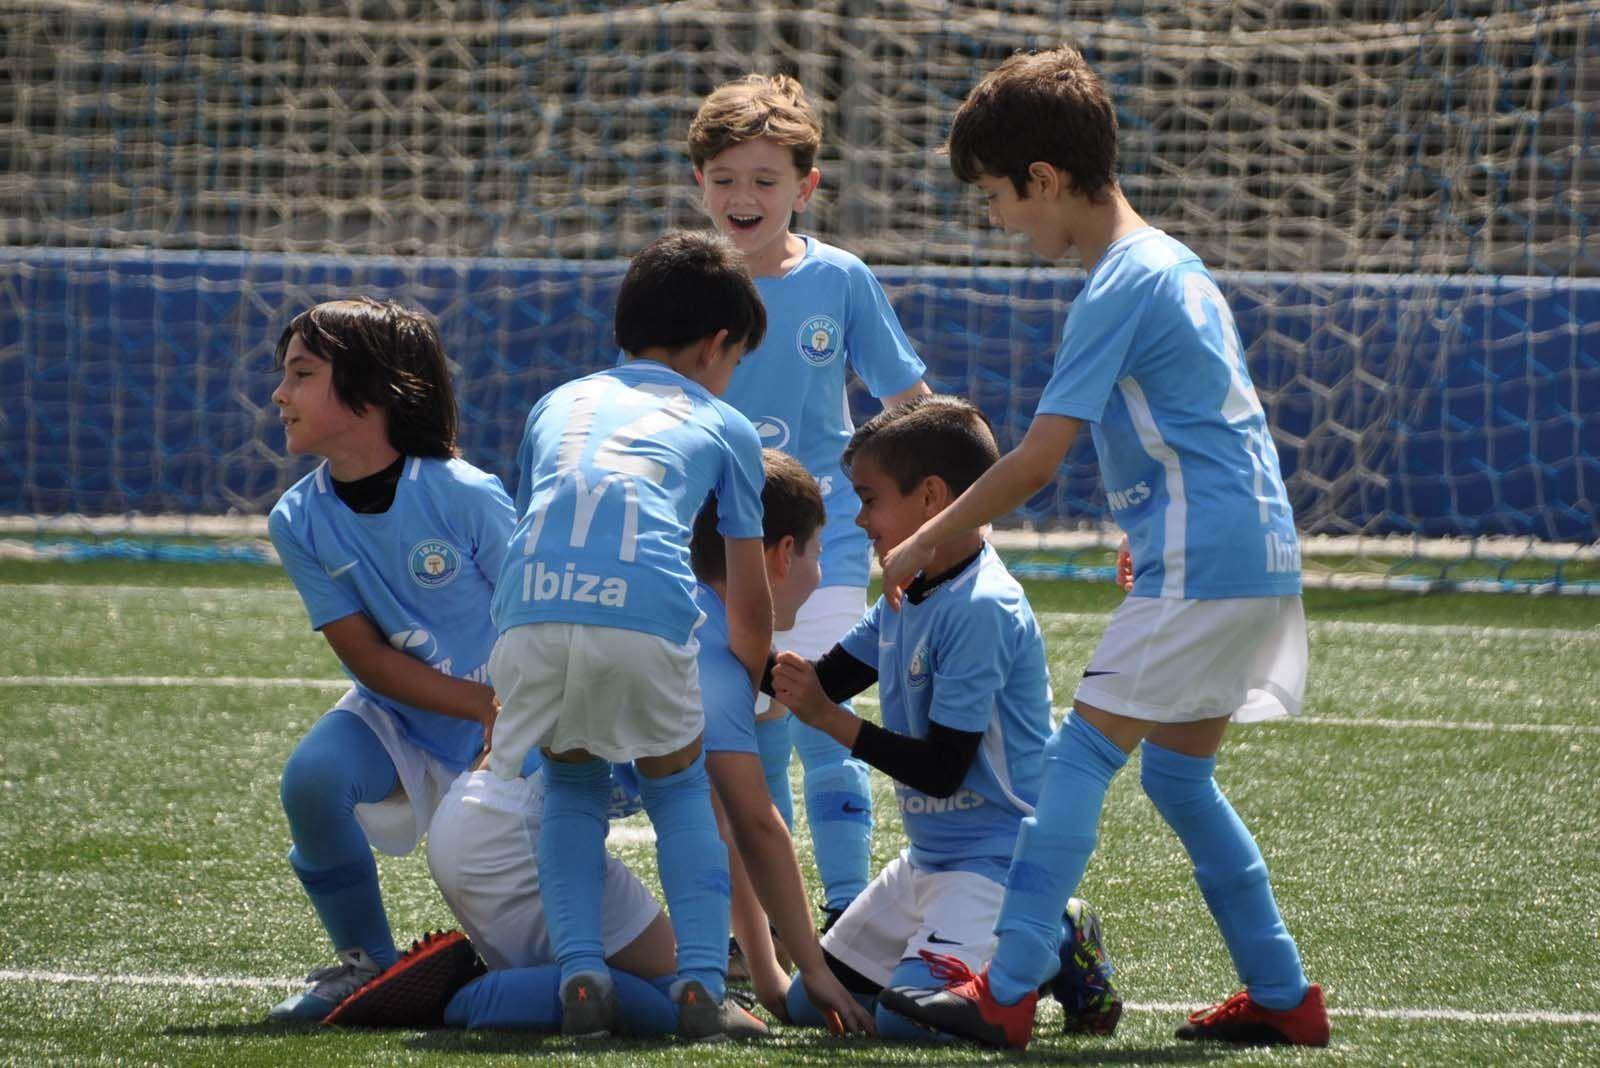 El fútbol base vuelve a sonreír